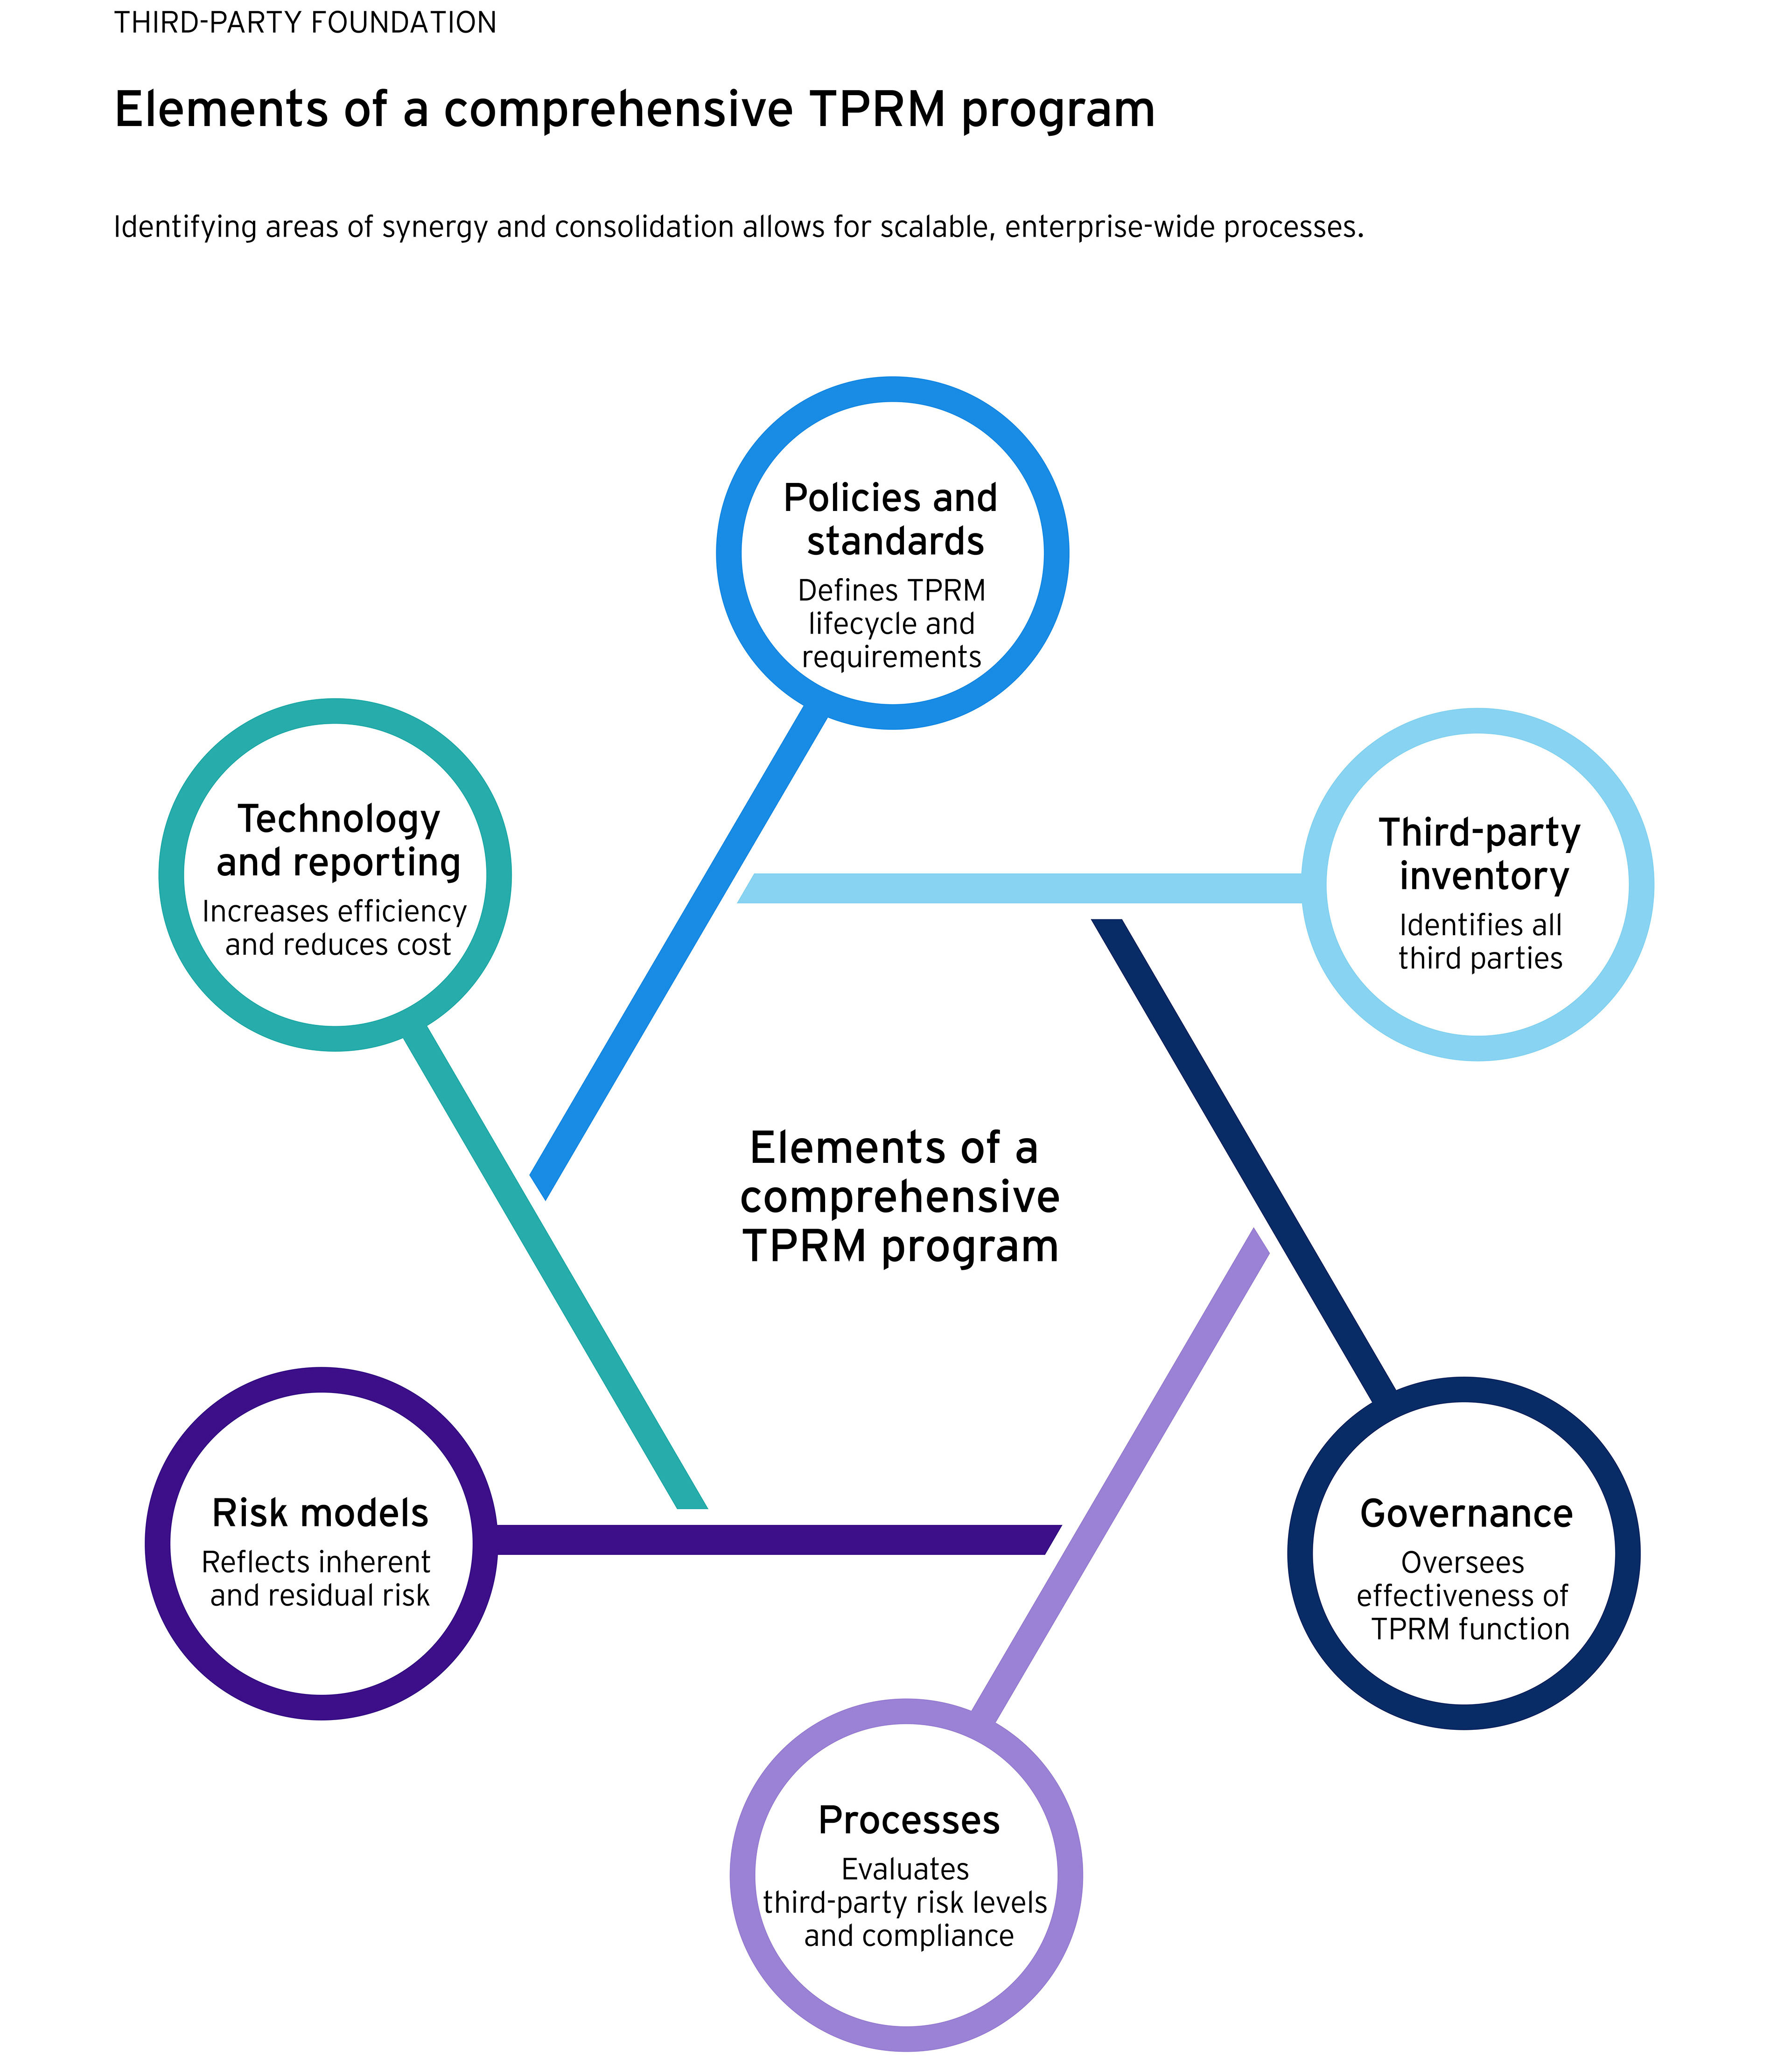 EY - Elements of a comprehensive TPRM program